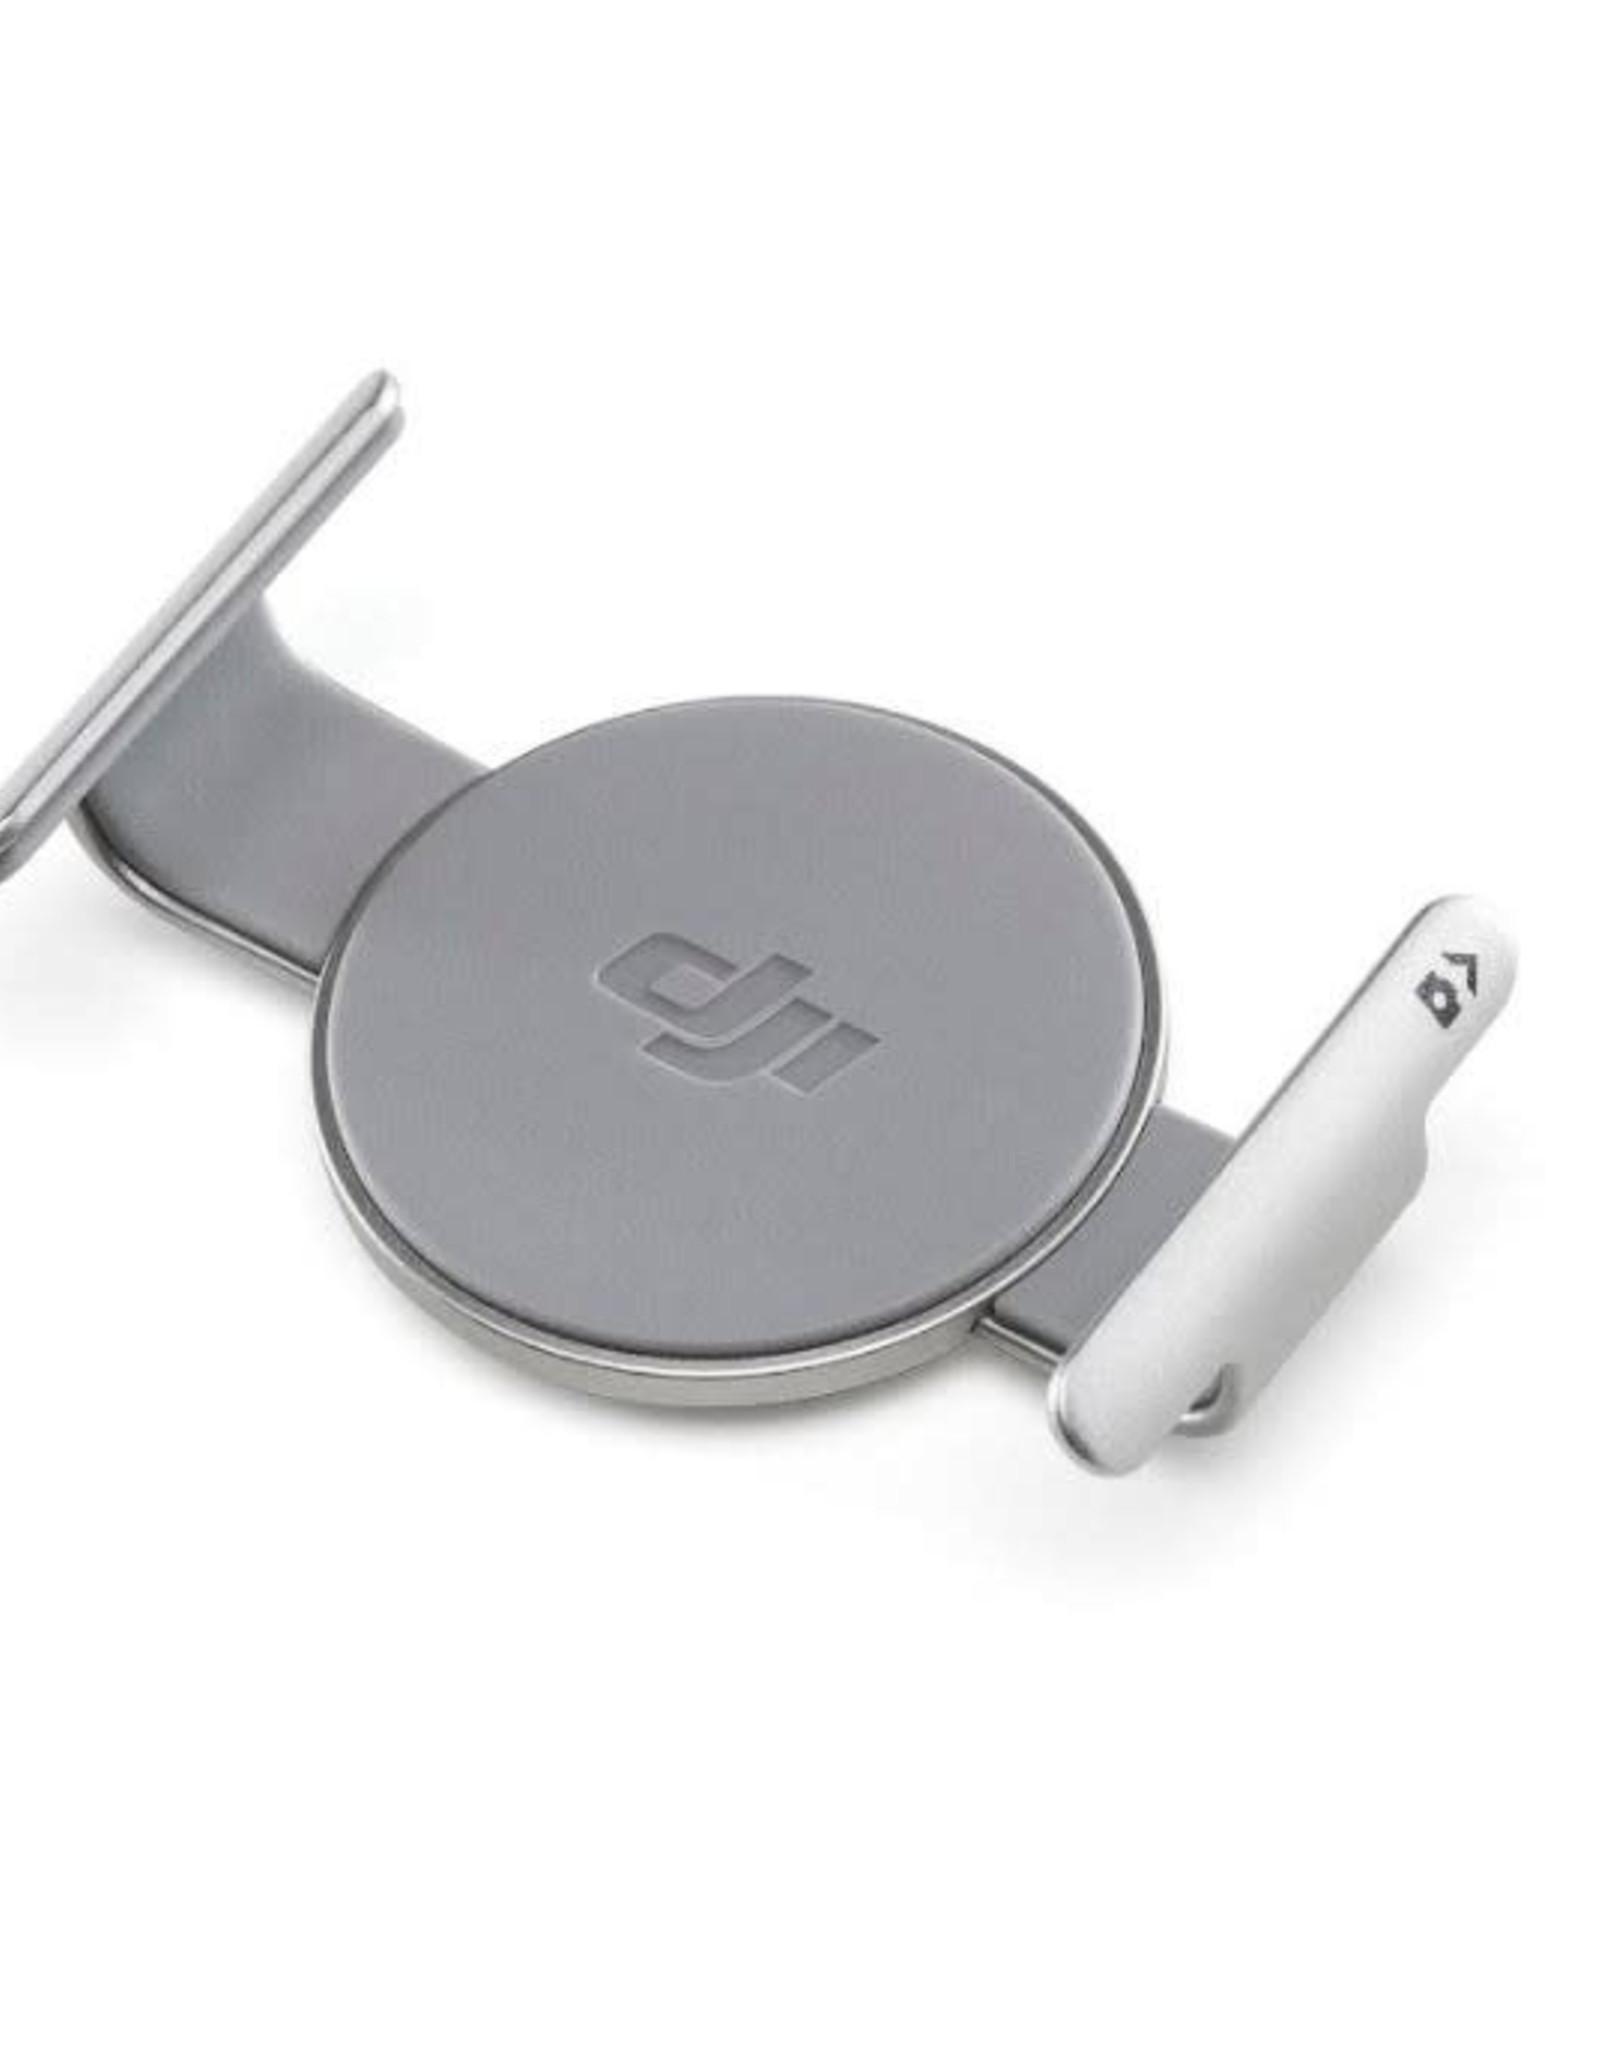 Dji DJI Osmo Mobile 4 OM 4